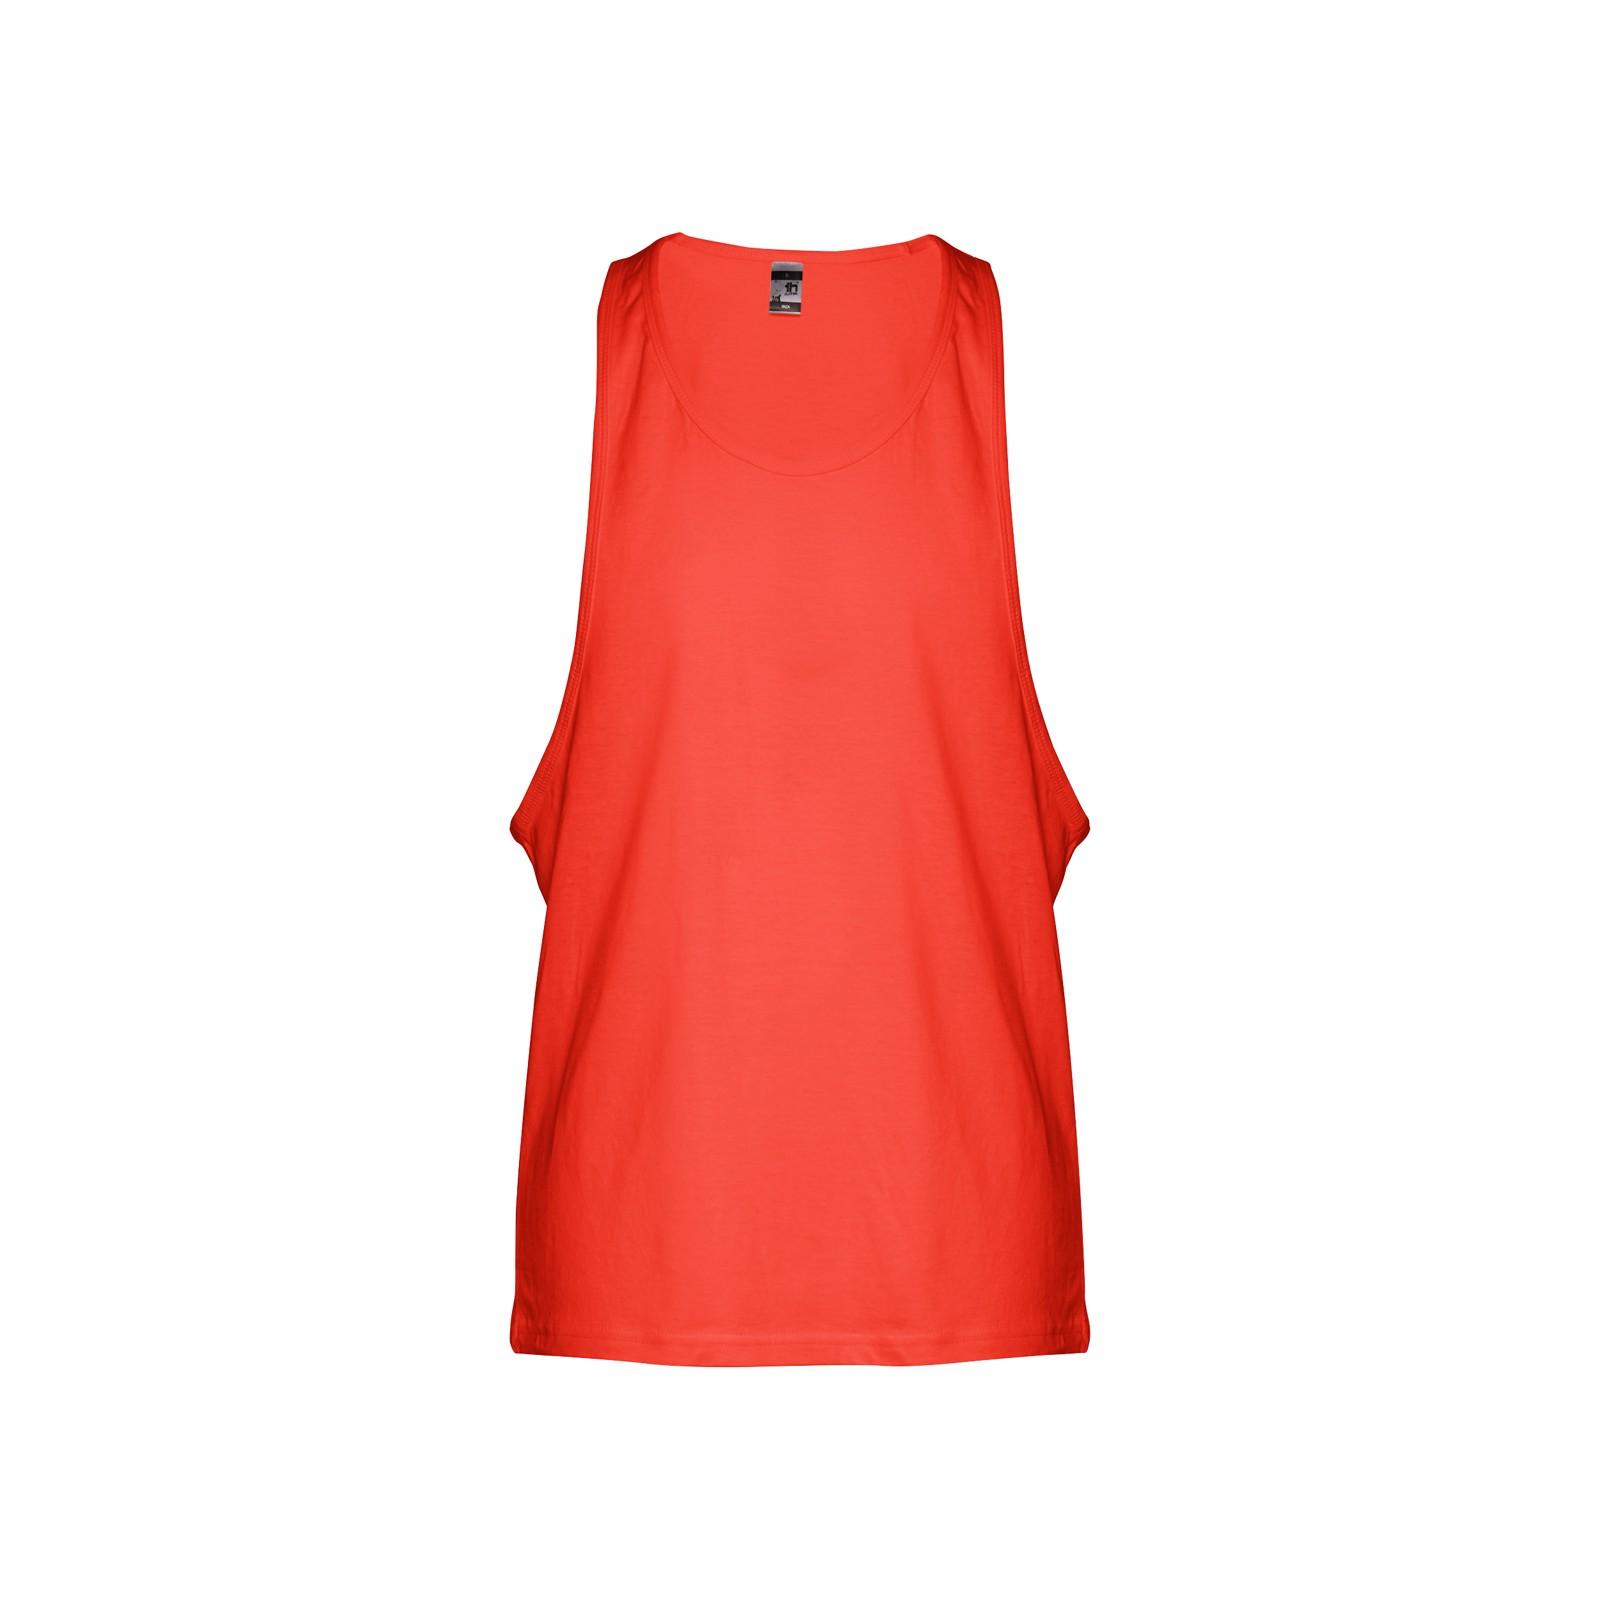 IBIZA. Men's tank top - Coral Orange / S